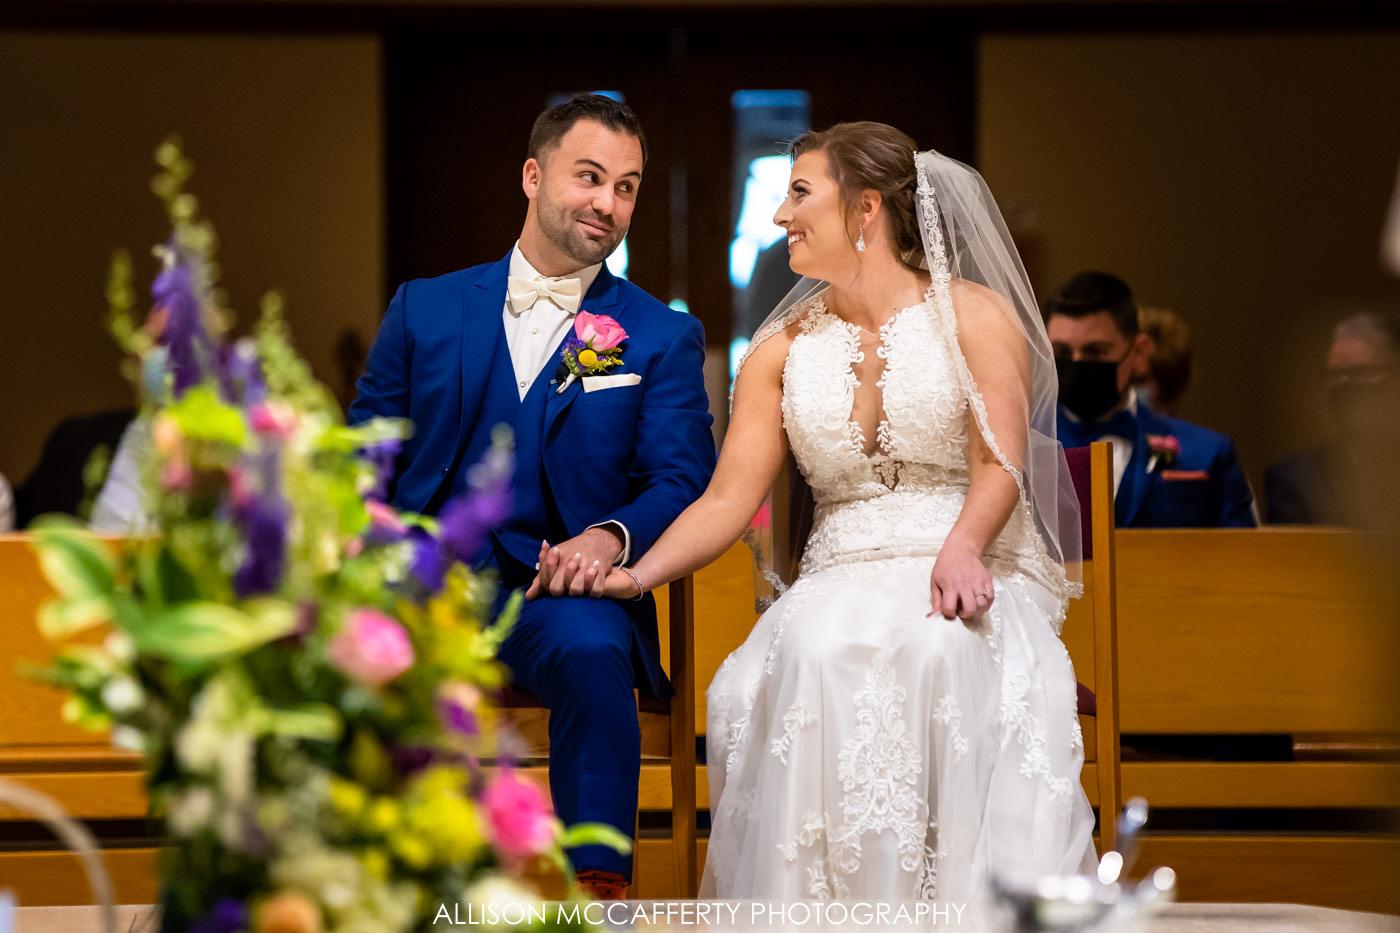 Pittsgrove NJ Wedding Photography